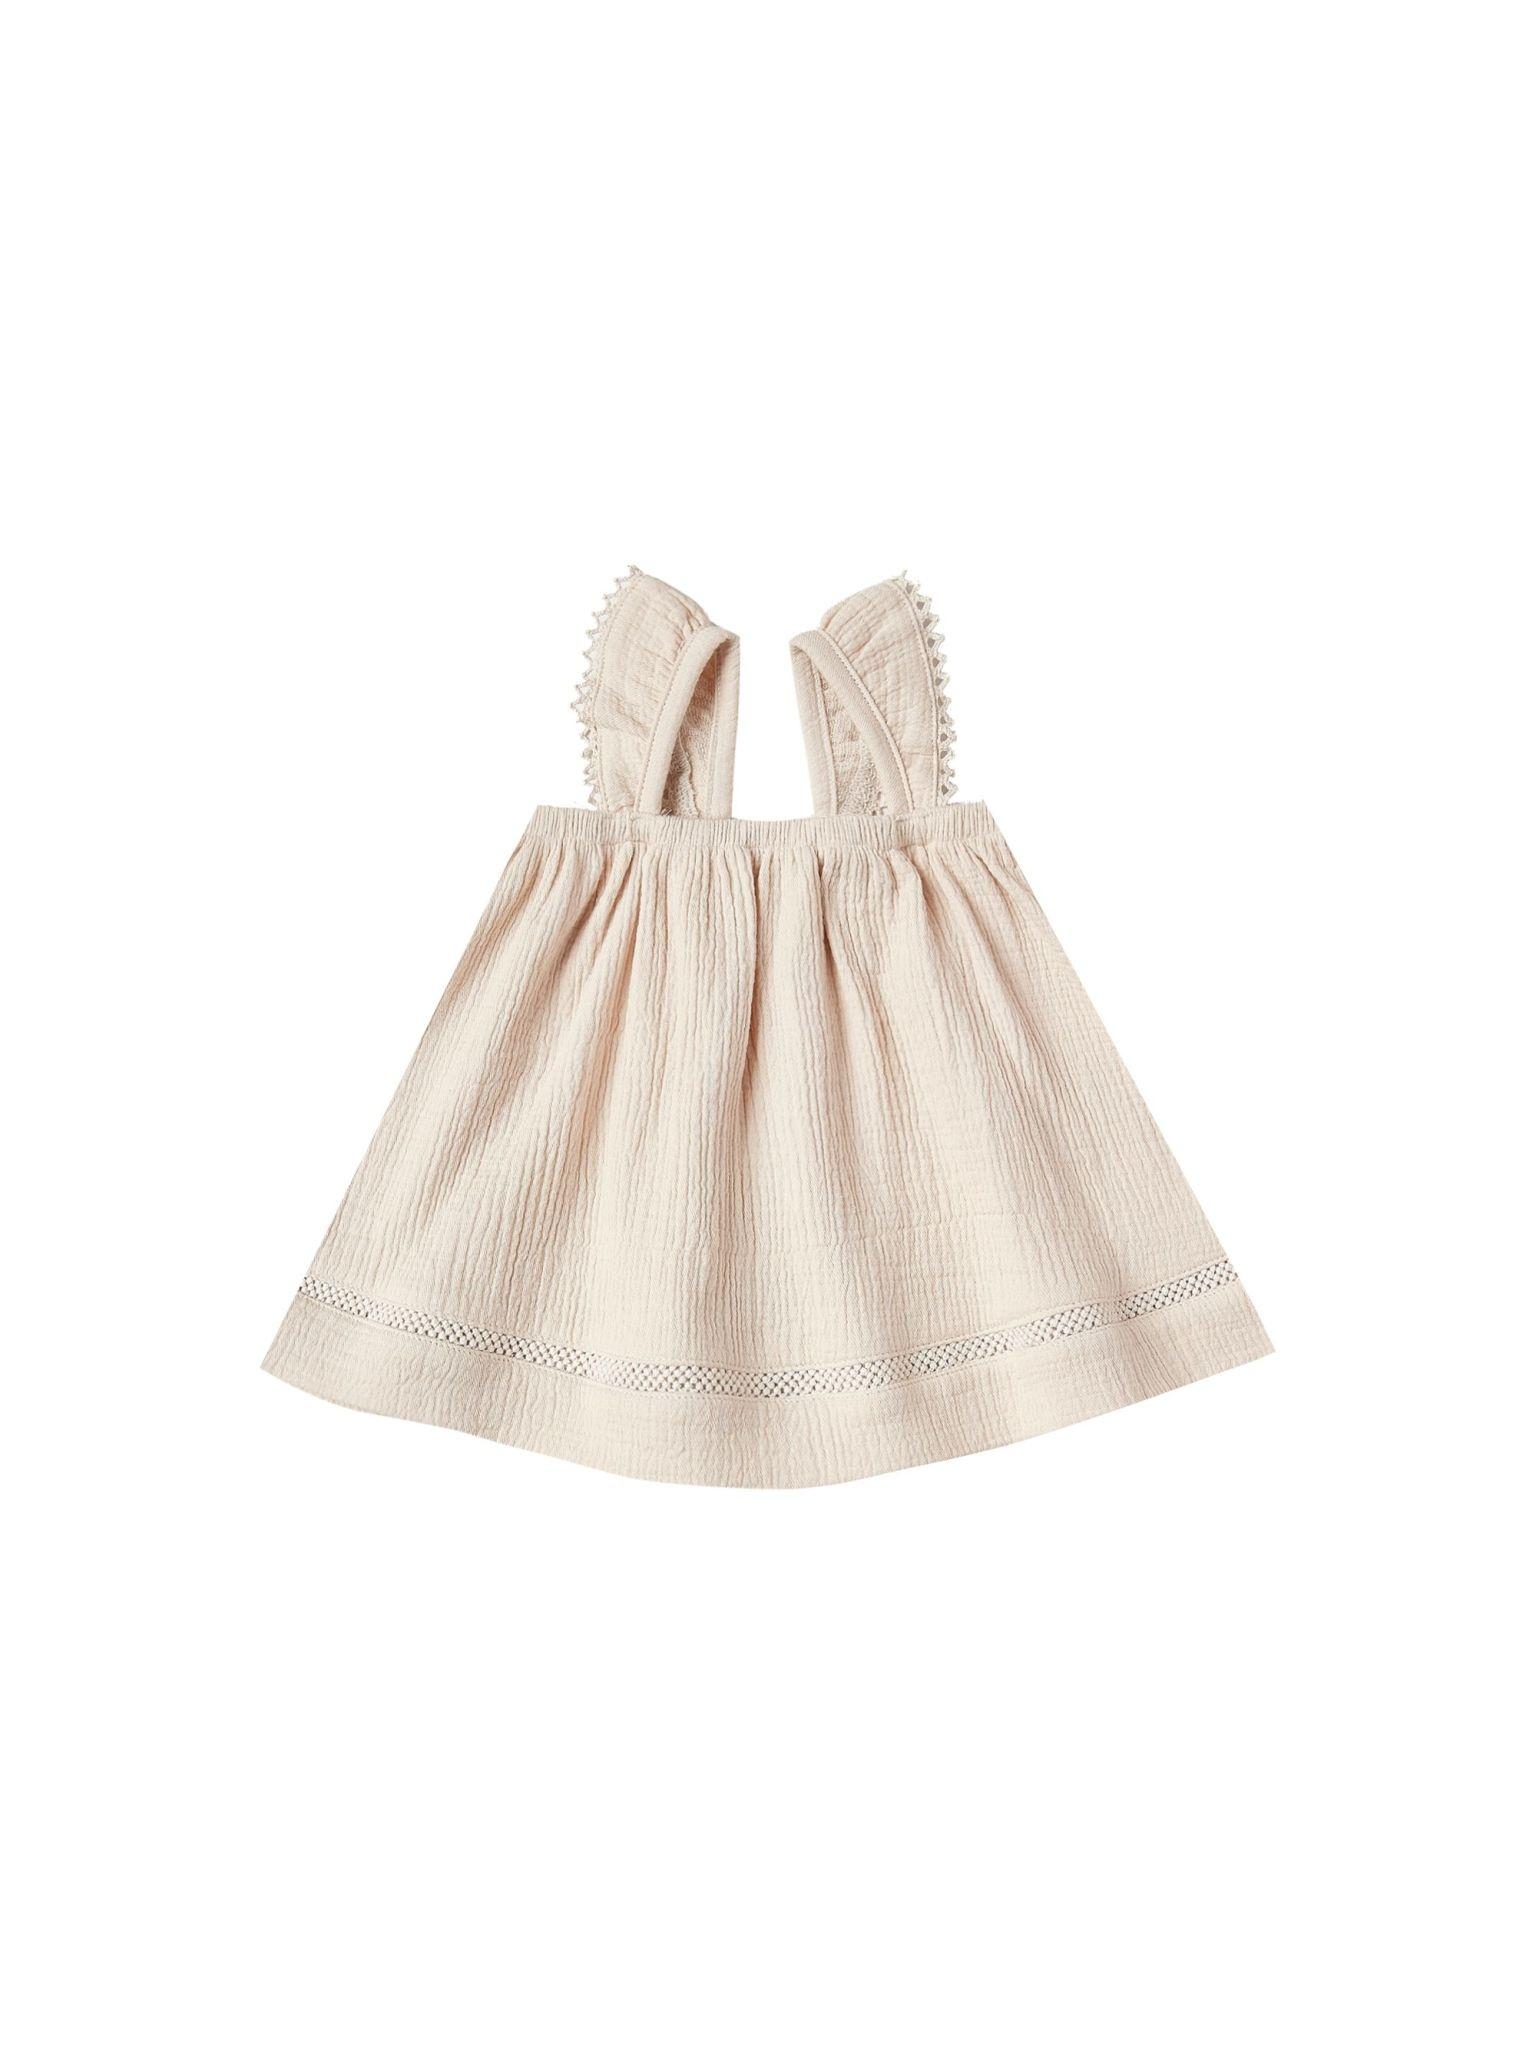 QUINCY MAE Organic Cotton Ruffle Tube Dress